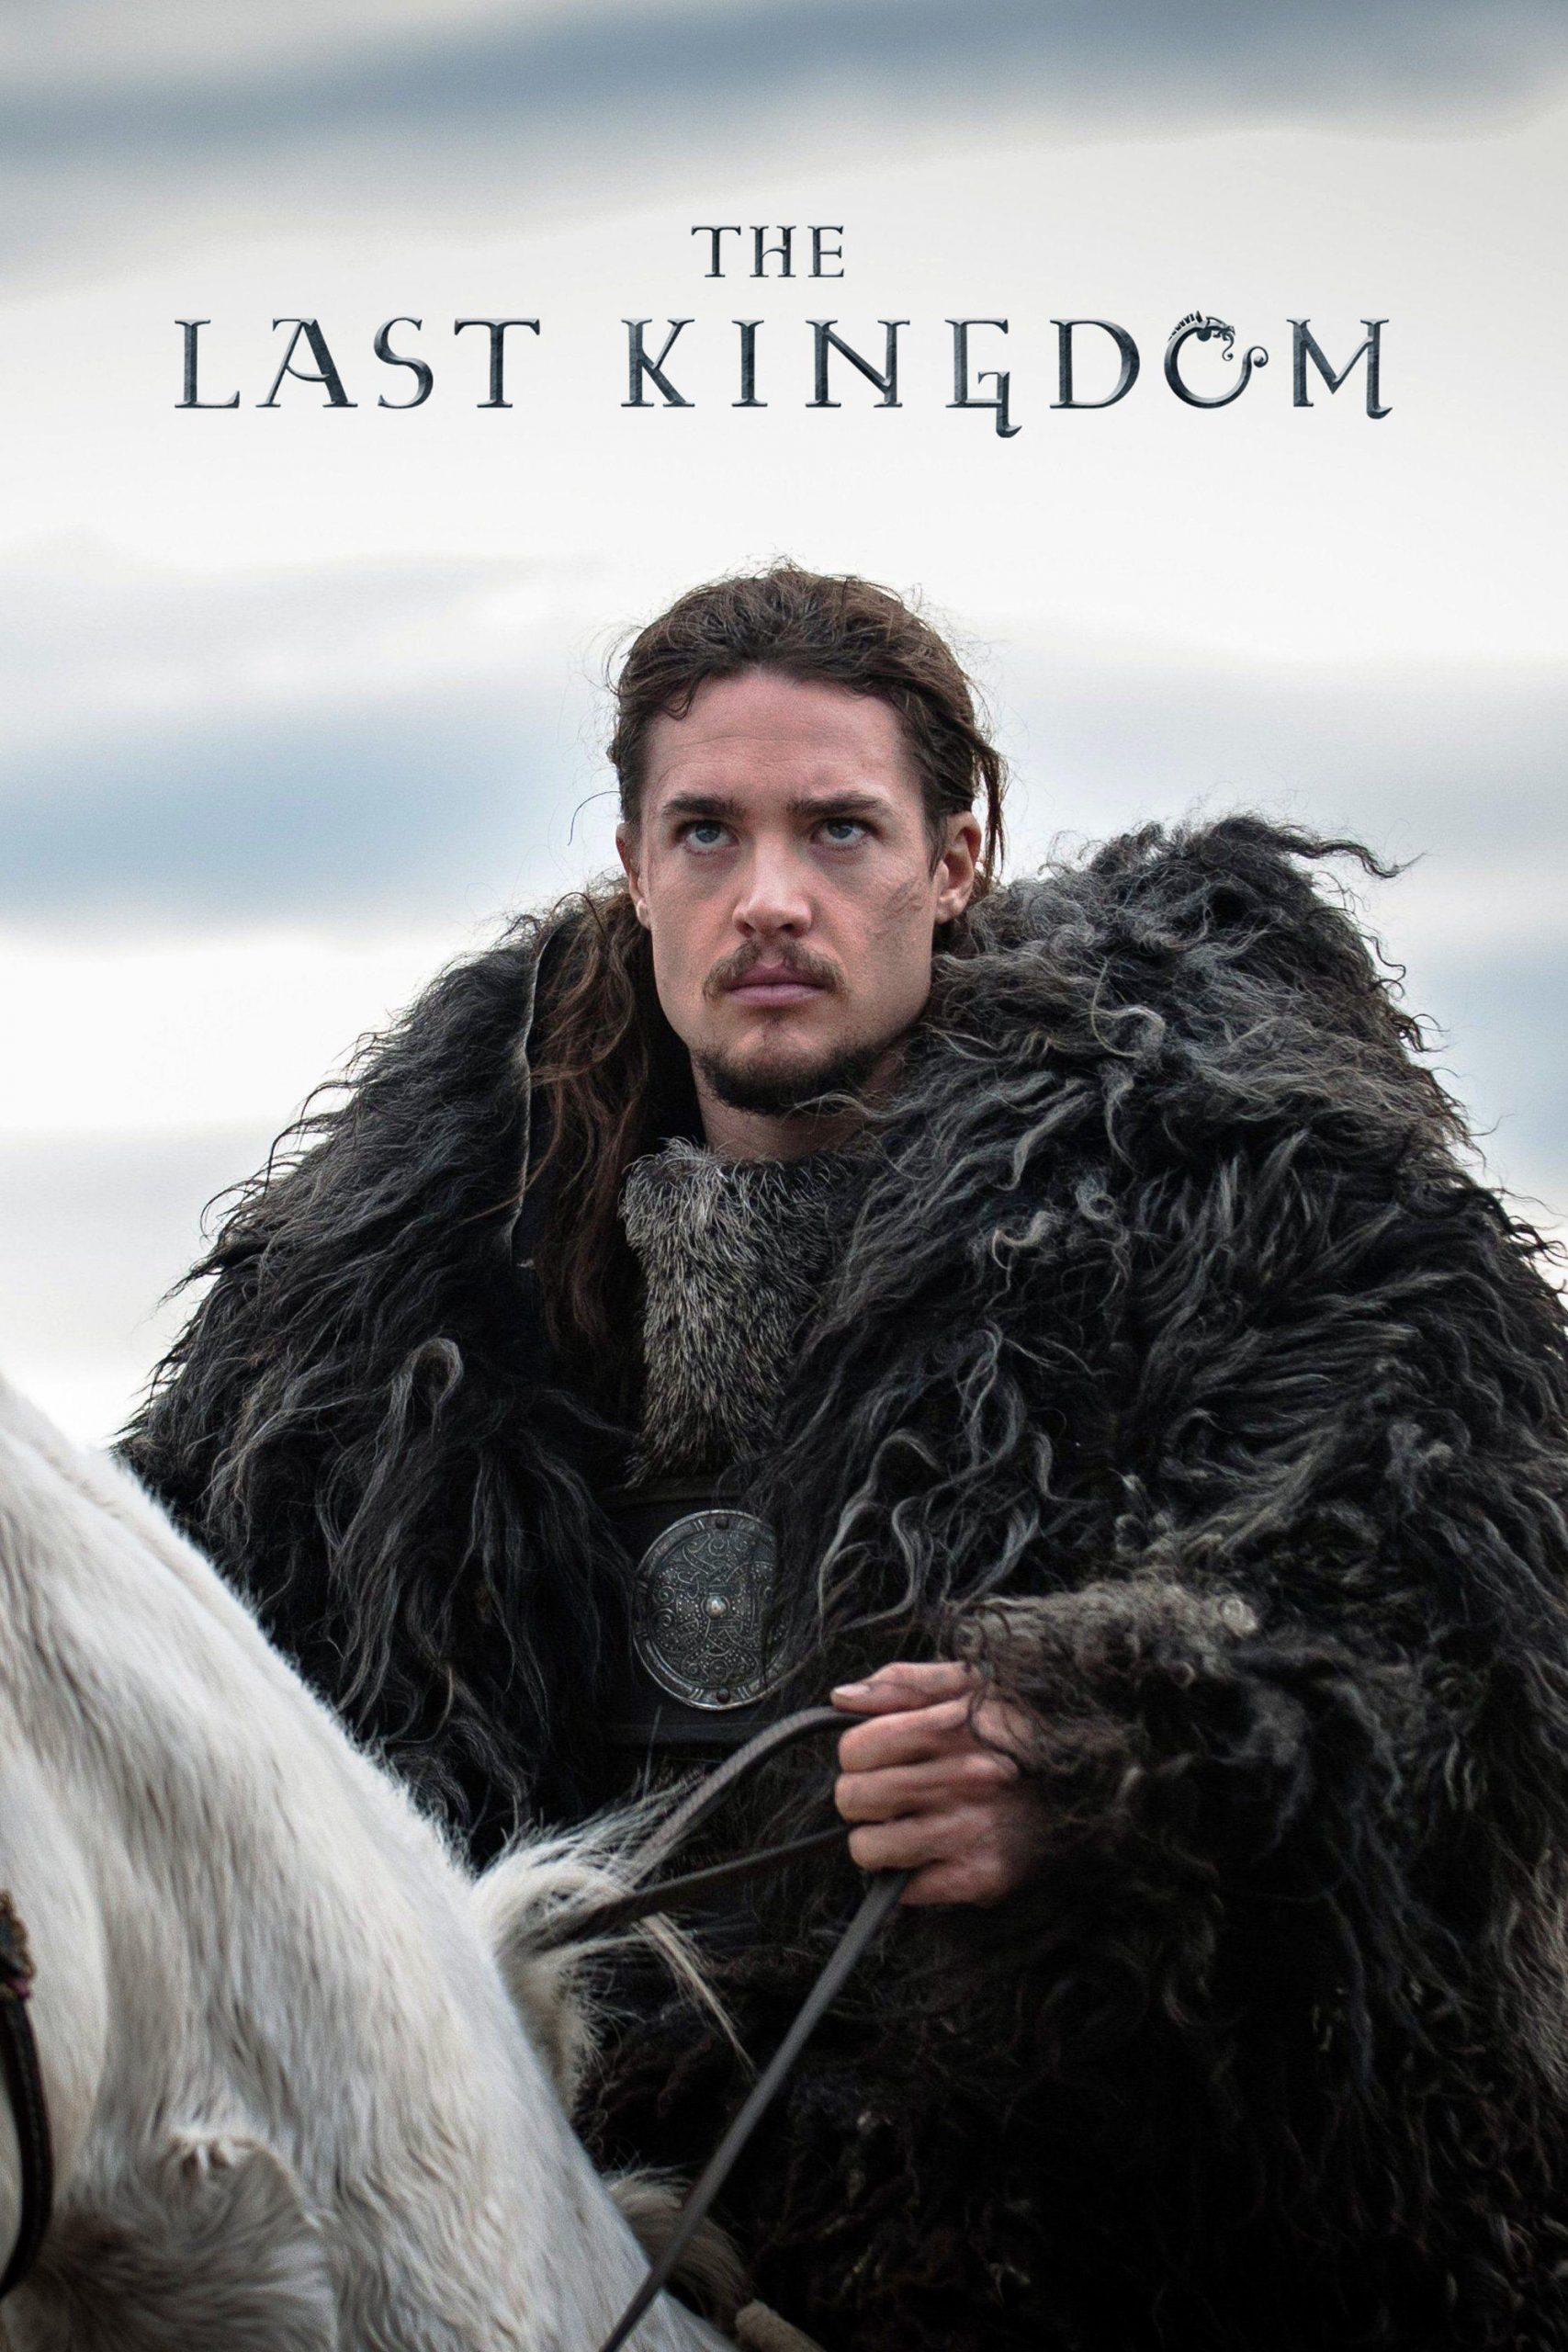 """The Last Kingdom"""